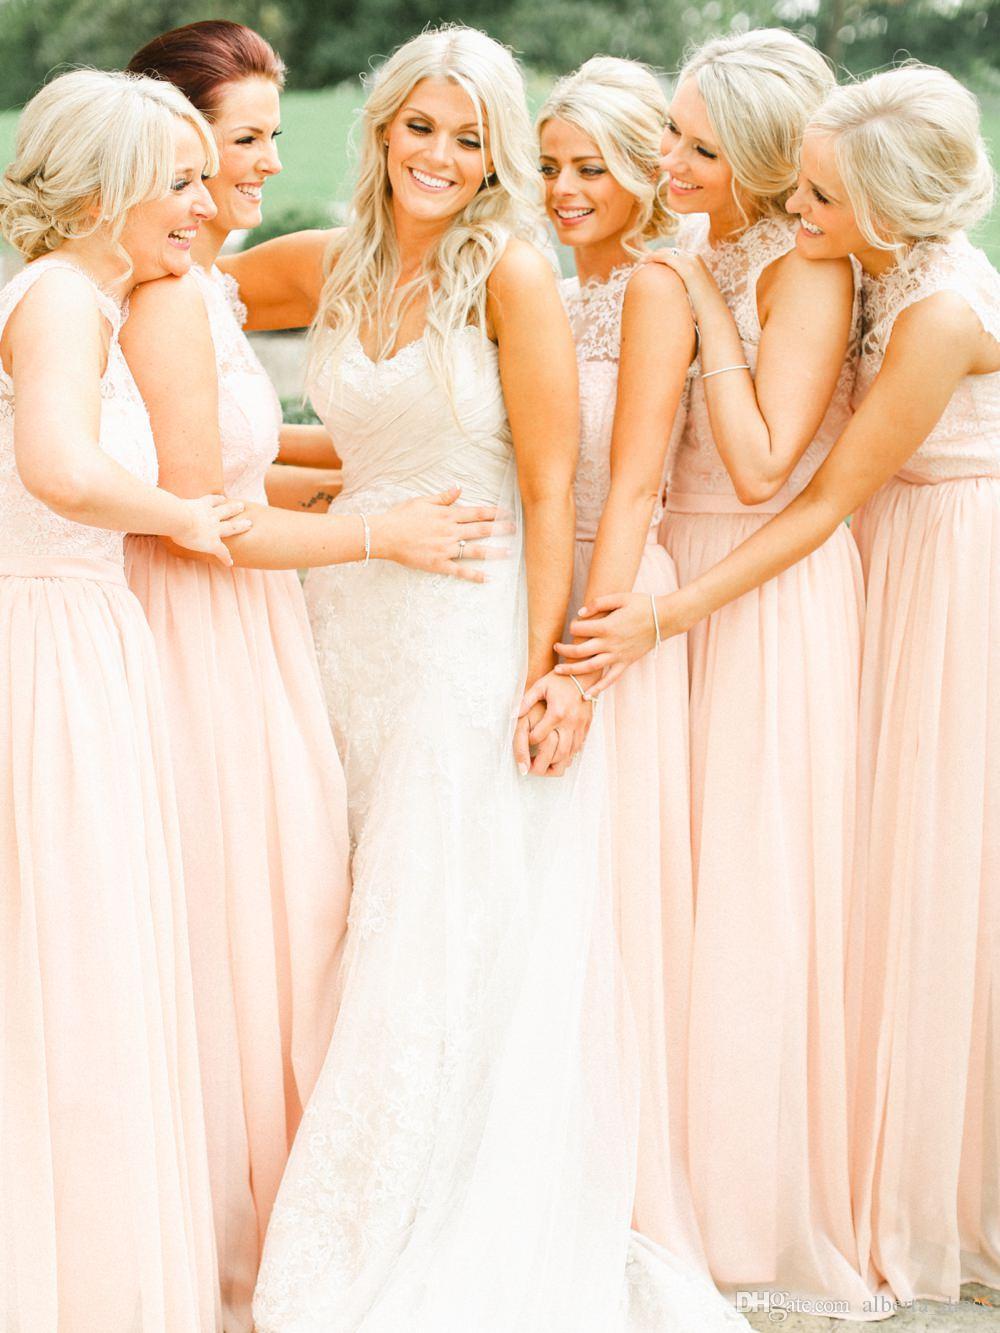 Bruidsmeisje Jurken Nieuwe Goedkope Juweel Hals Sheer Kant Chiffon Pink Long Voor Bruiloft Plus Size Long Beach Partyjurken Vestidos onder 100